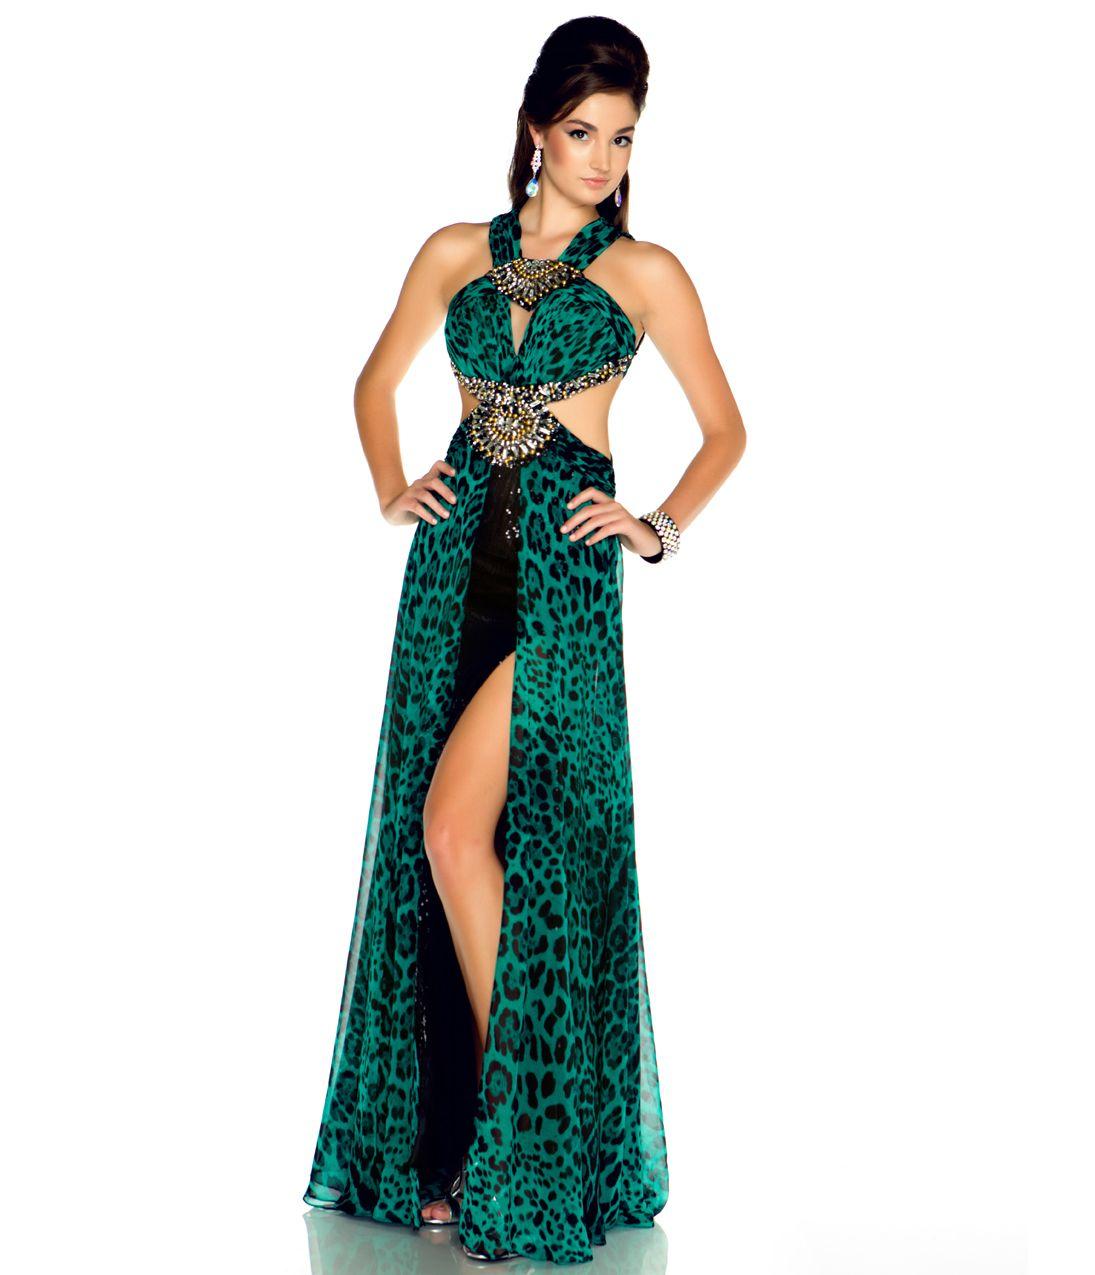 Cheetah Print Prom Dresses Duggal 2013 Prom Dresses Emerald